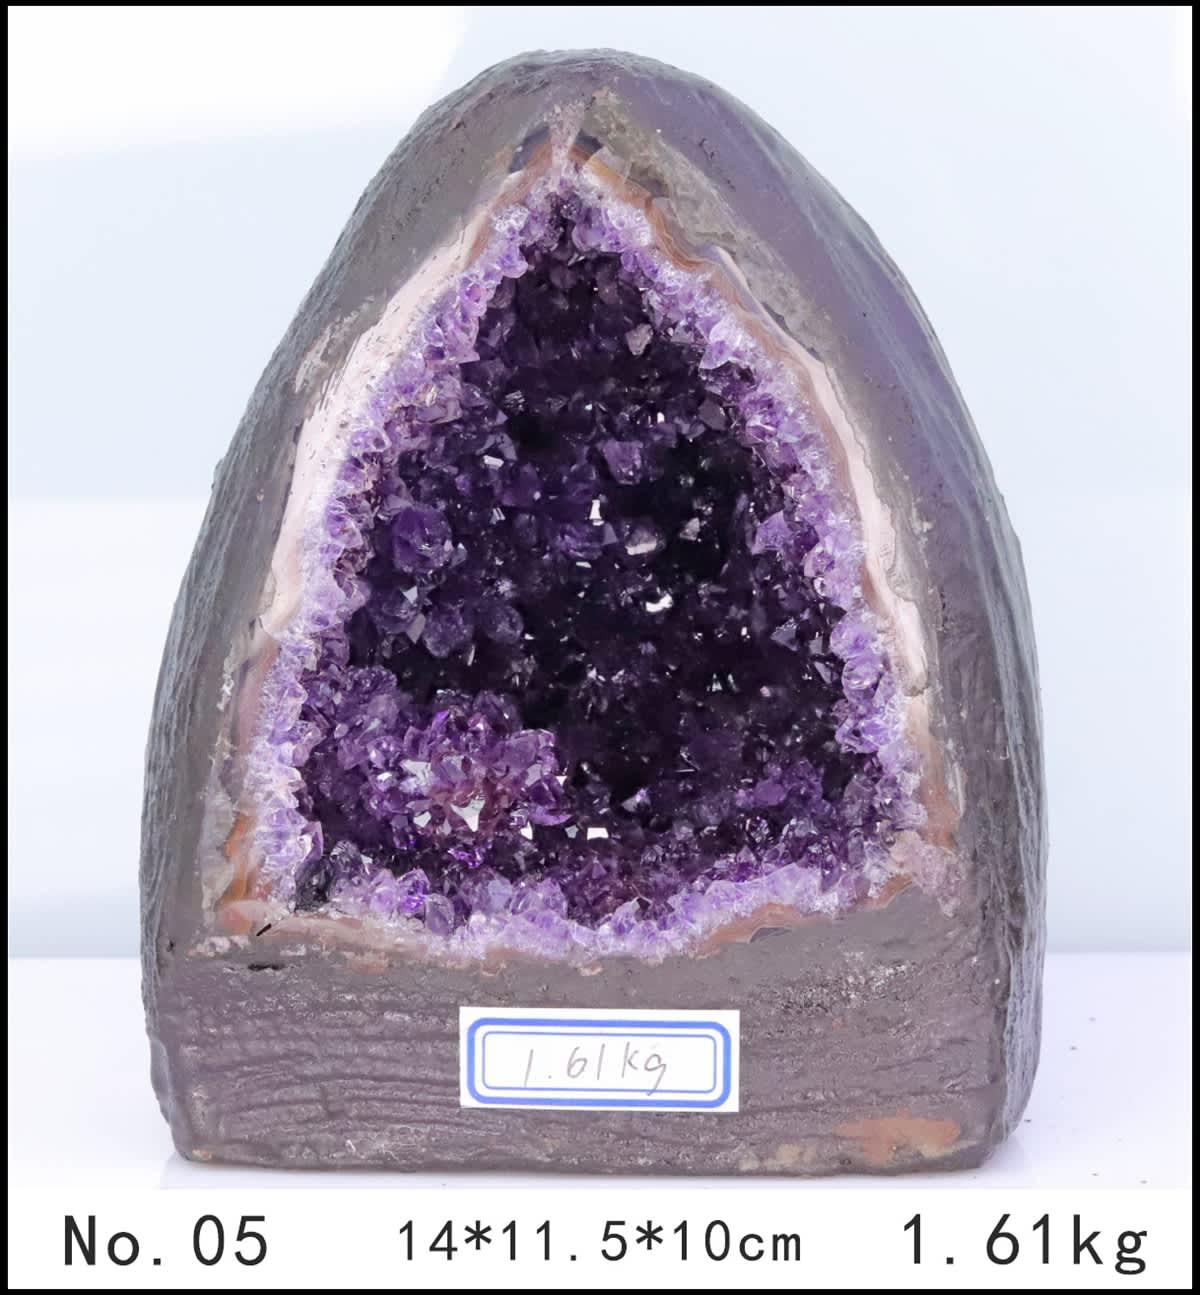 Amatista geoda Natural agujero racimo de cuarzo espécimen de cristal de sanación energética trueno huevo de desmagnetización de carga de energía